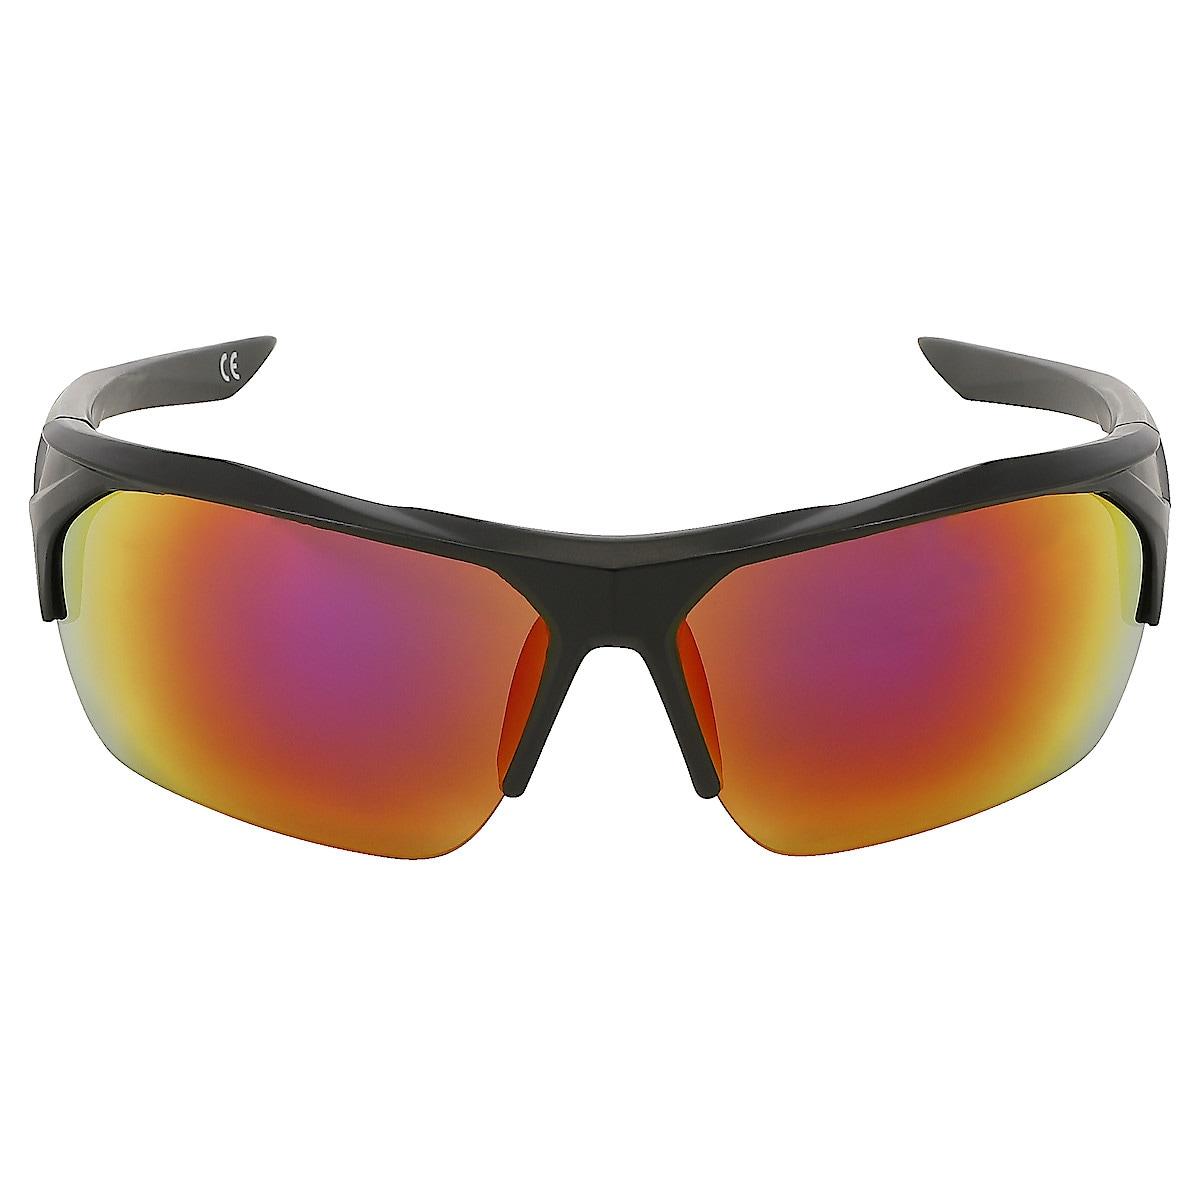 Solglasögon sport, svart